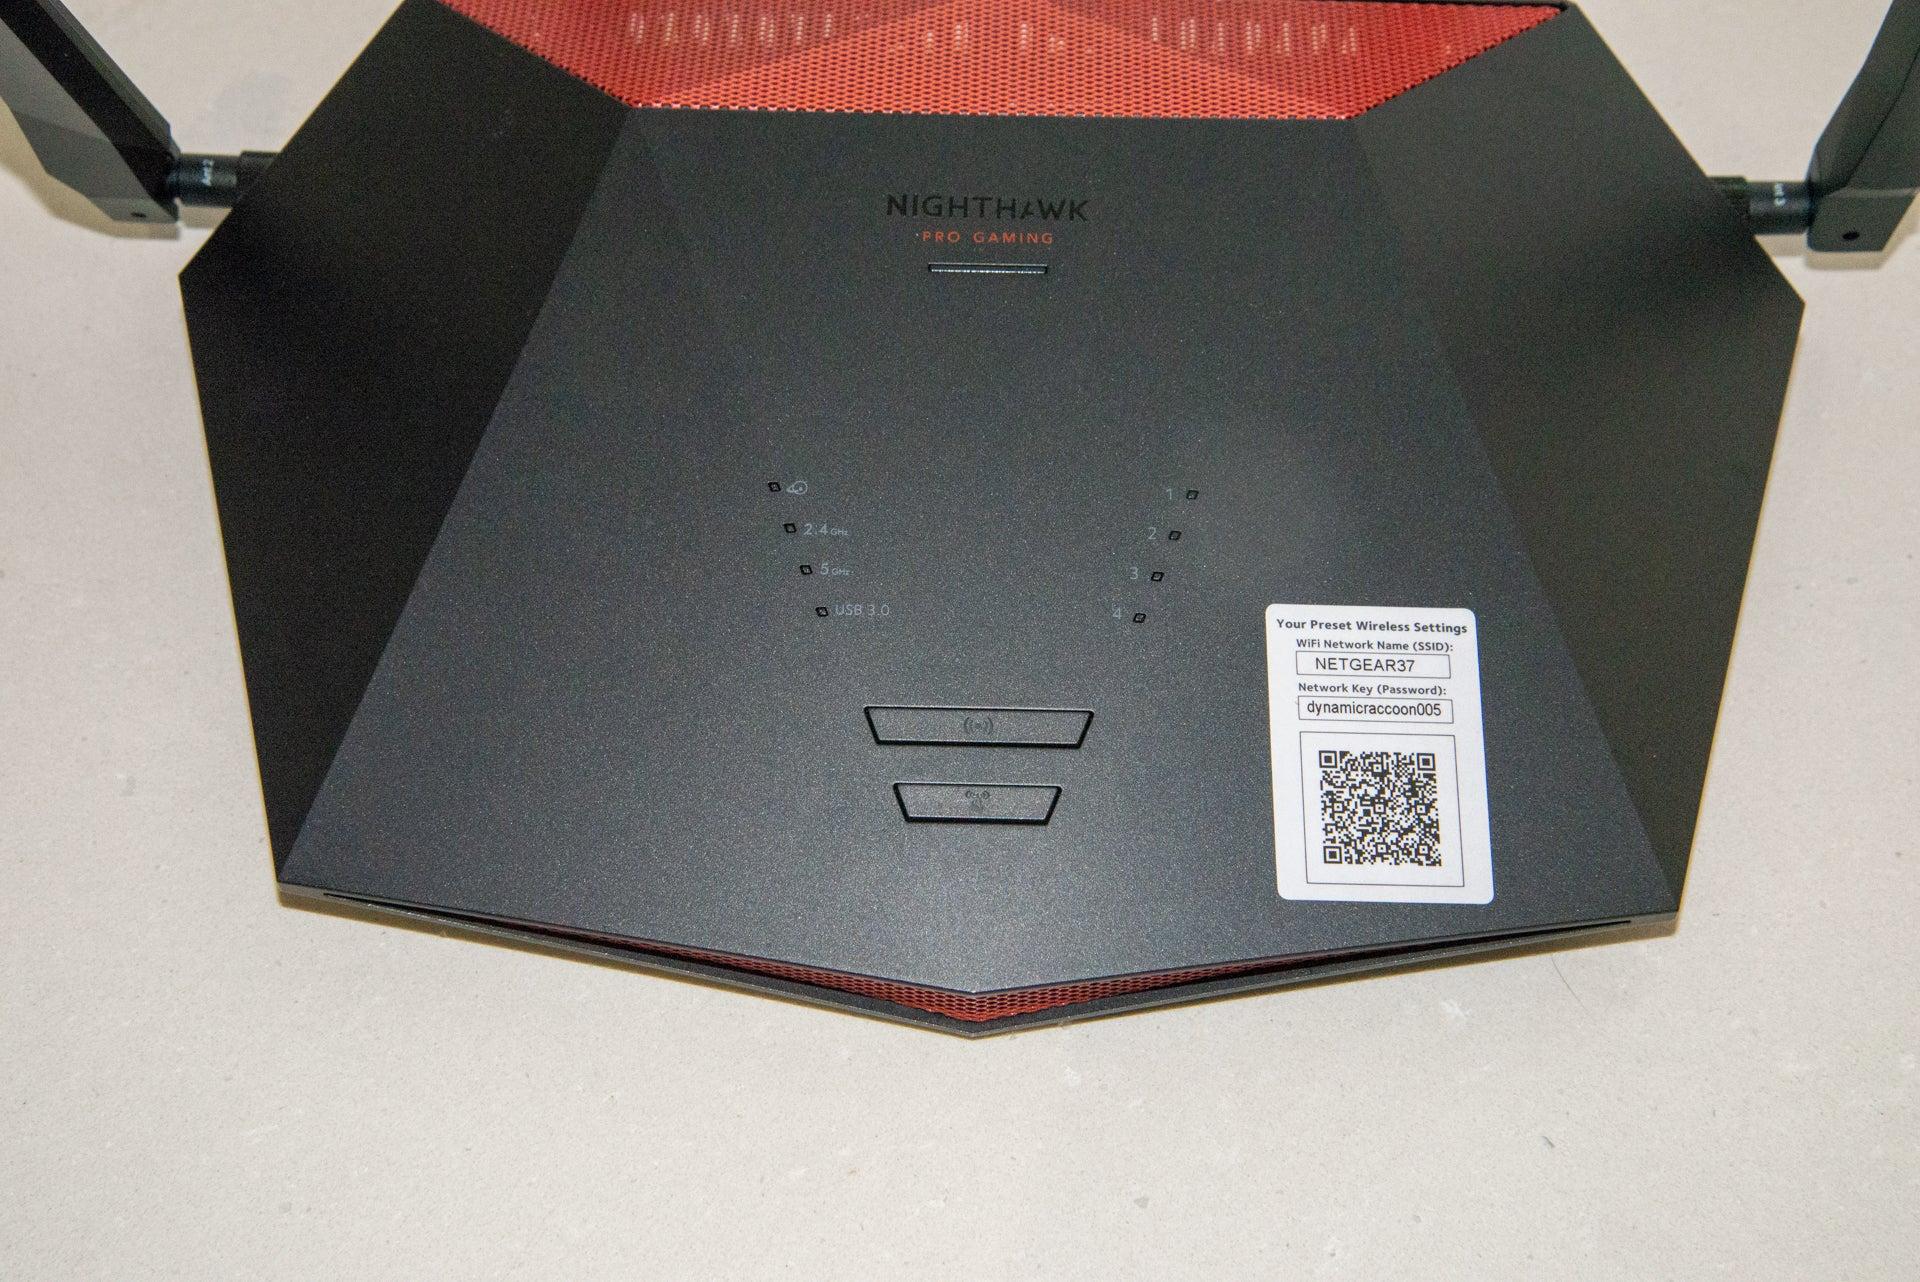 Netgear Nighthawk XR1000 front